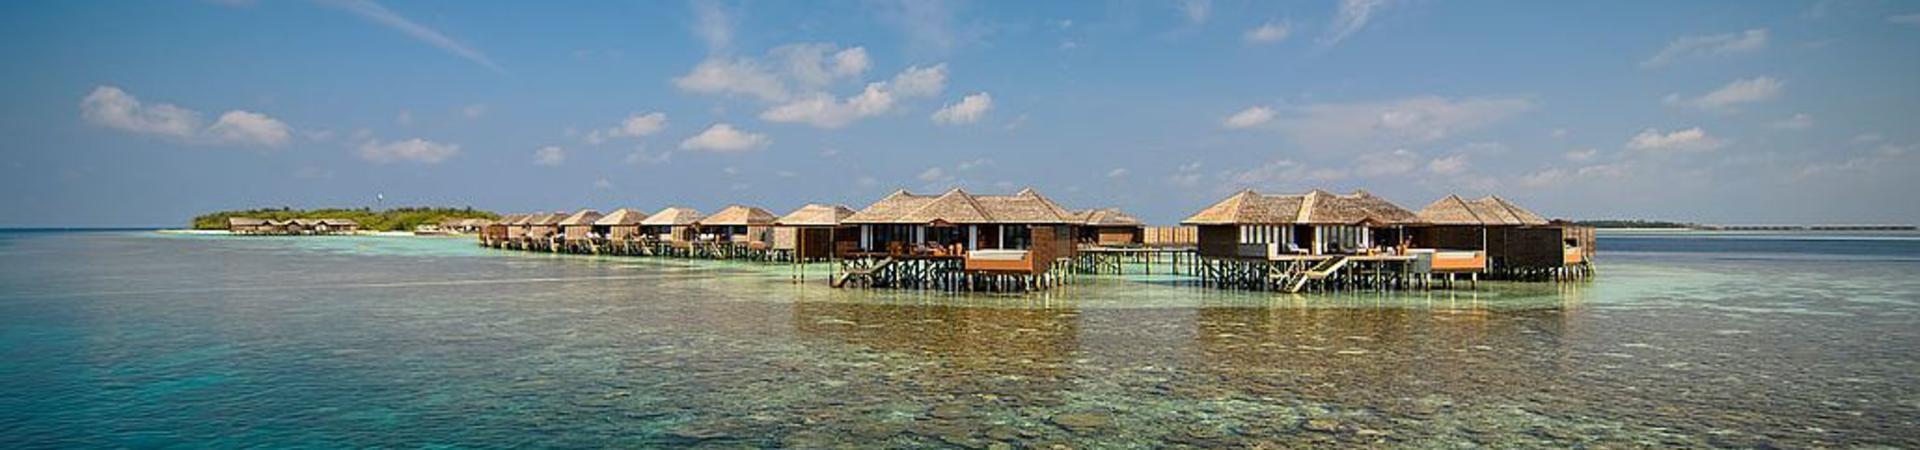 Maldives - Lily Beach Resort